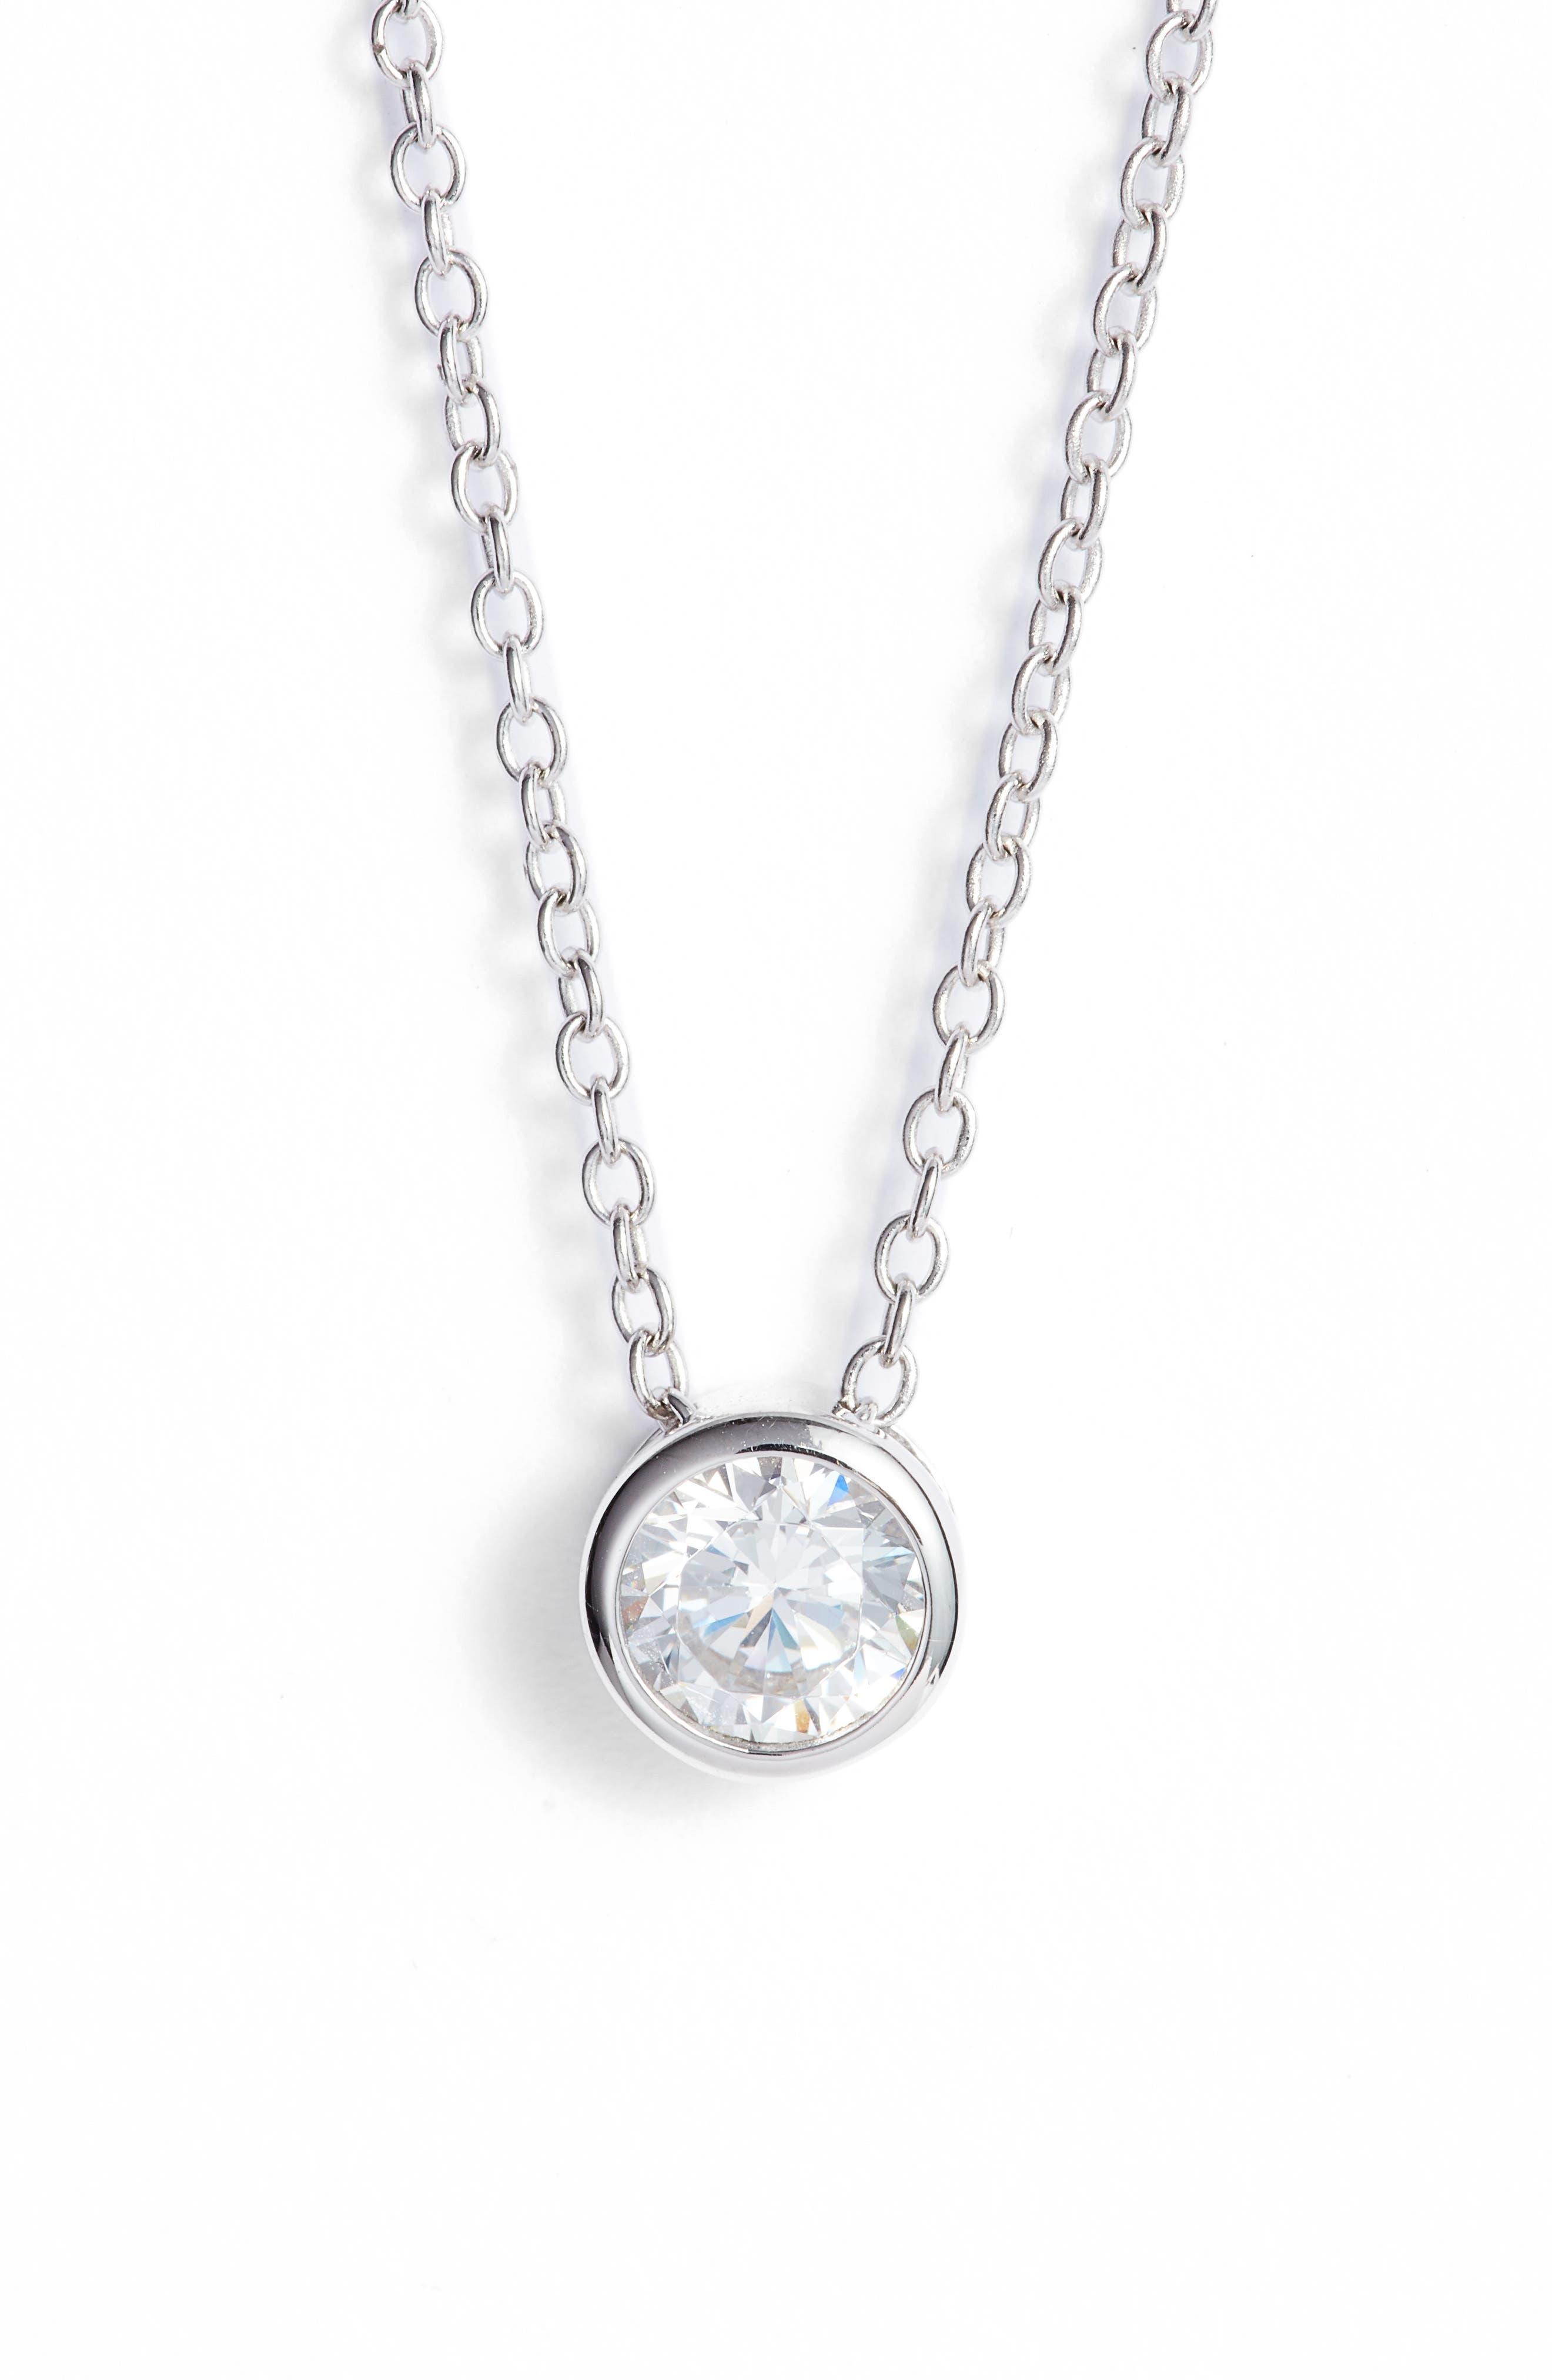 0.5 ct tw Cubic Zirconia Pendant Necklace,                         Main,                         color, Platinum